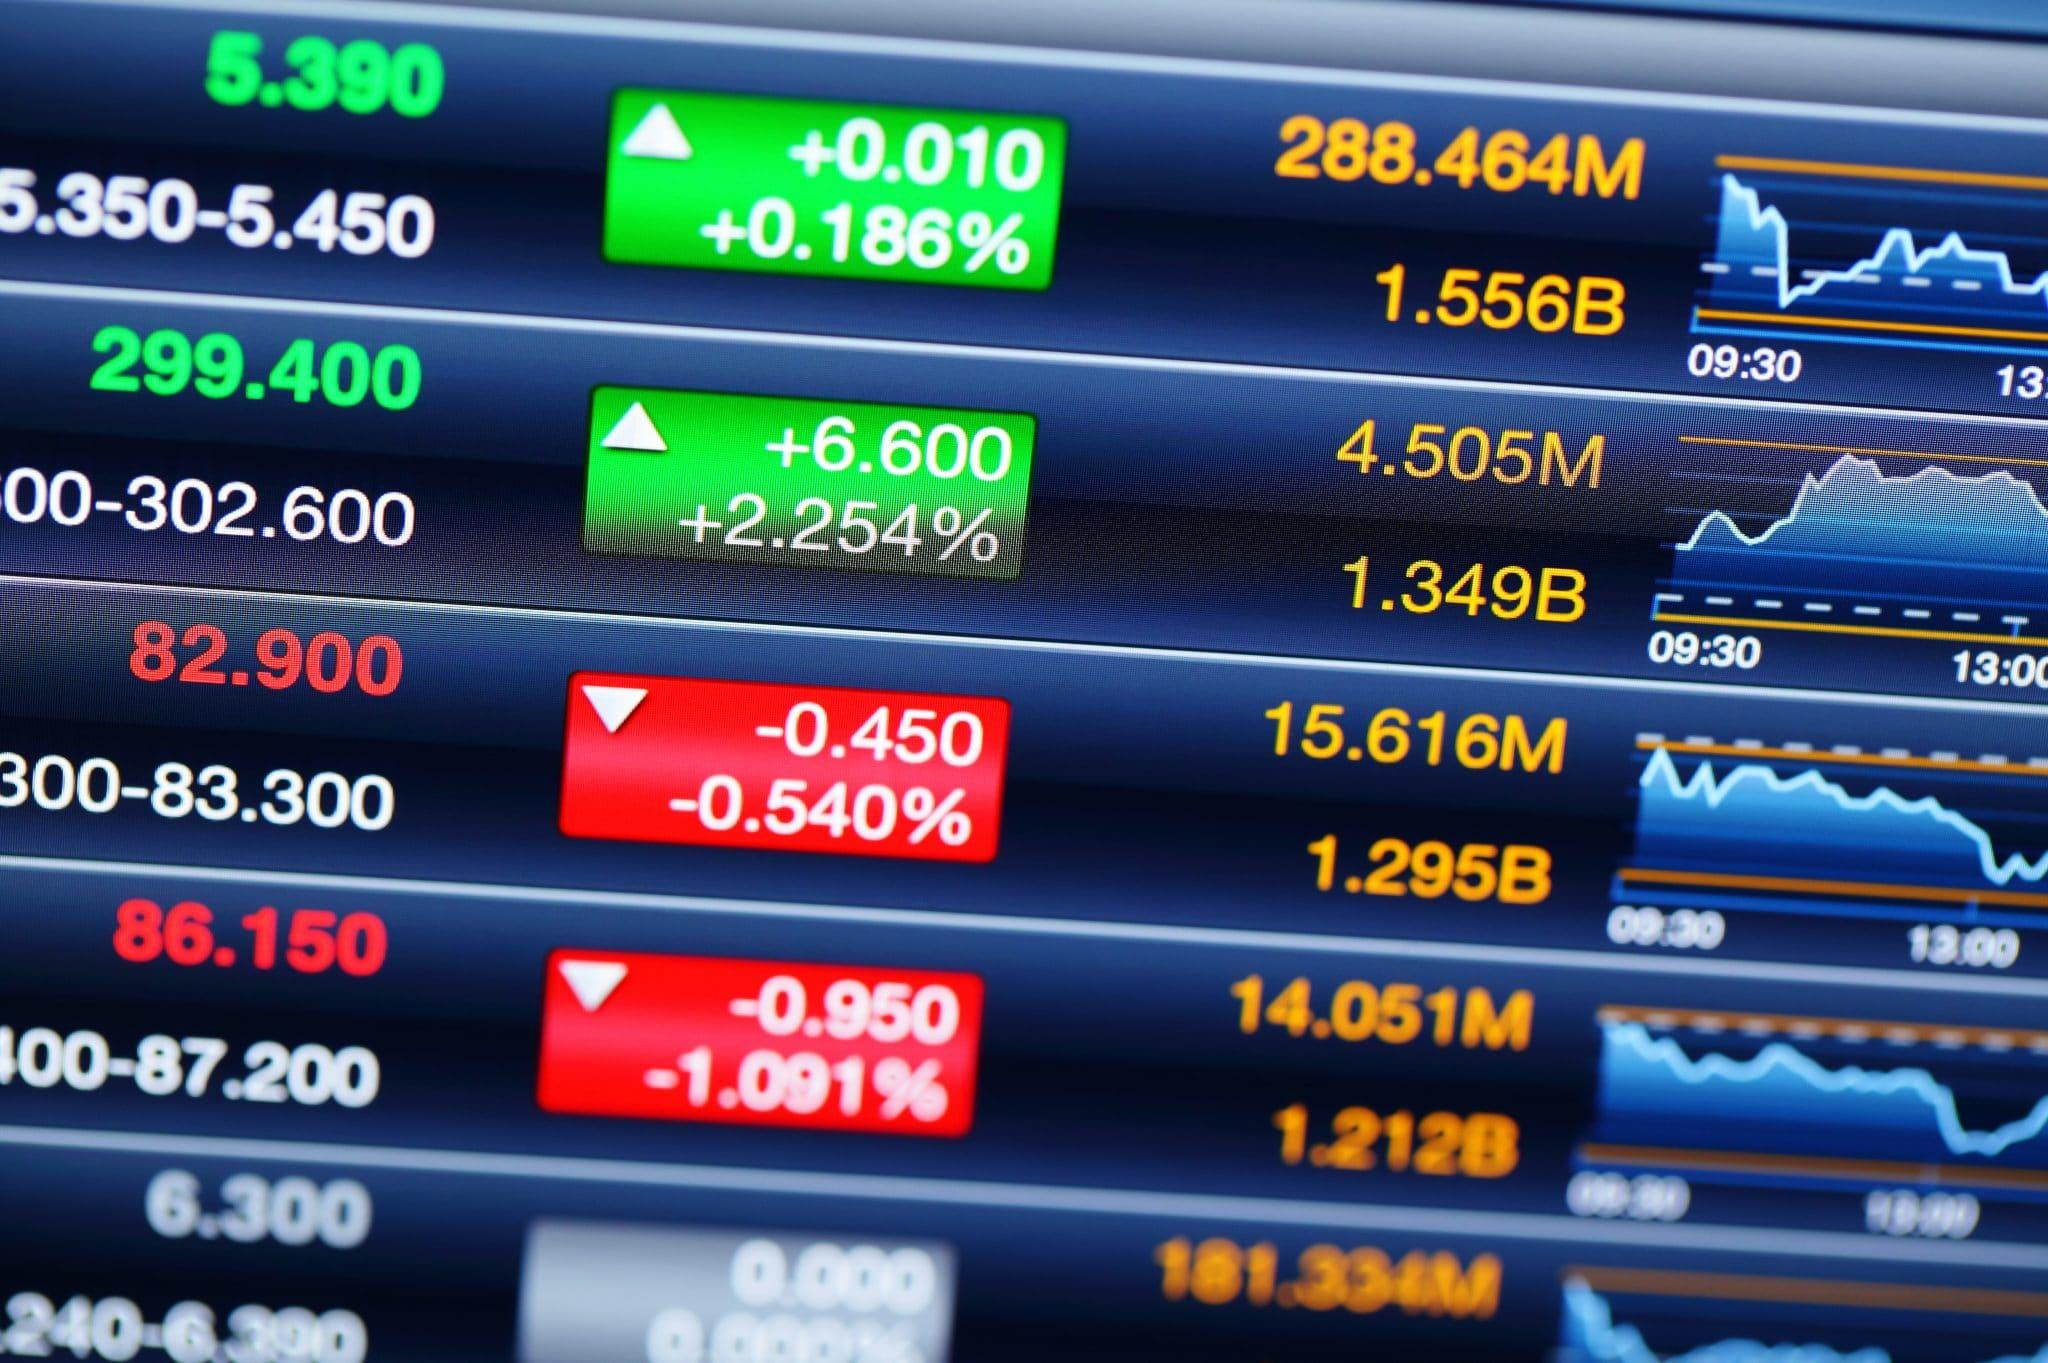 Stocks market prices